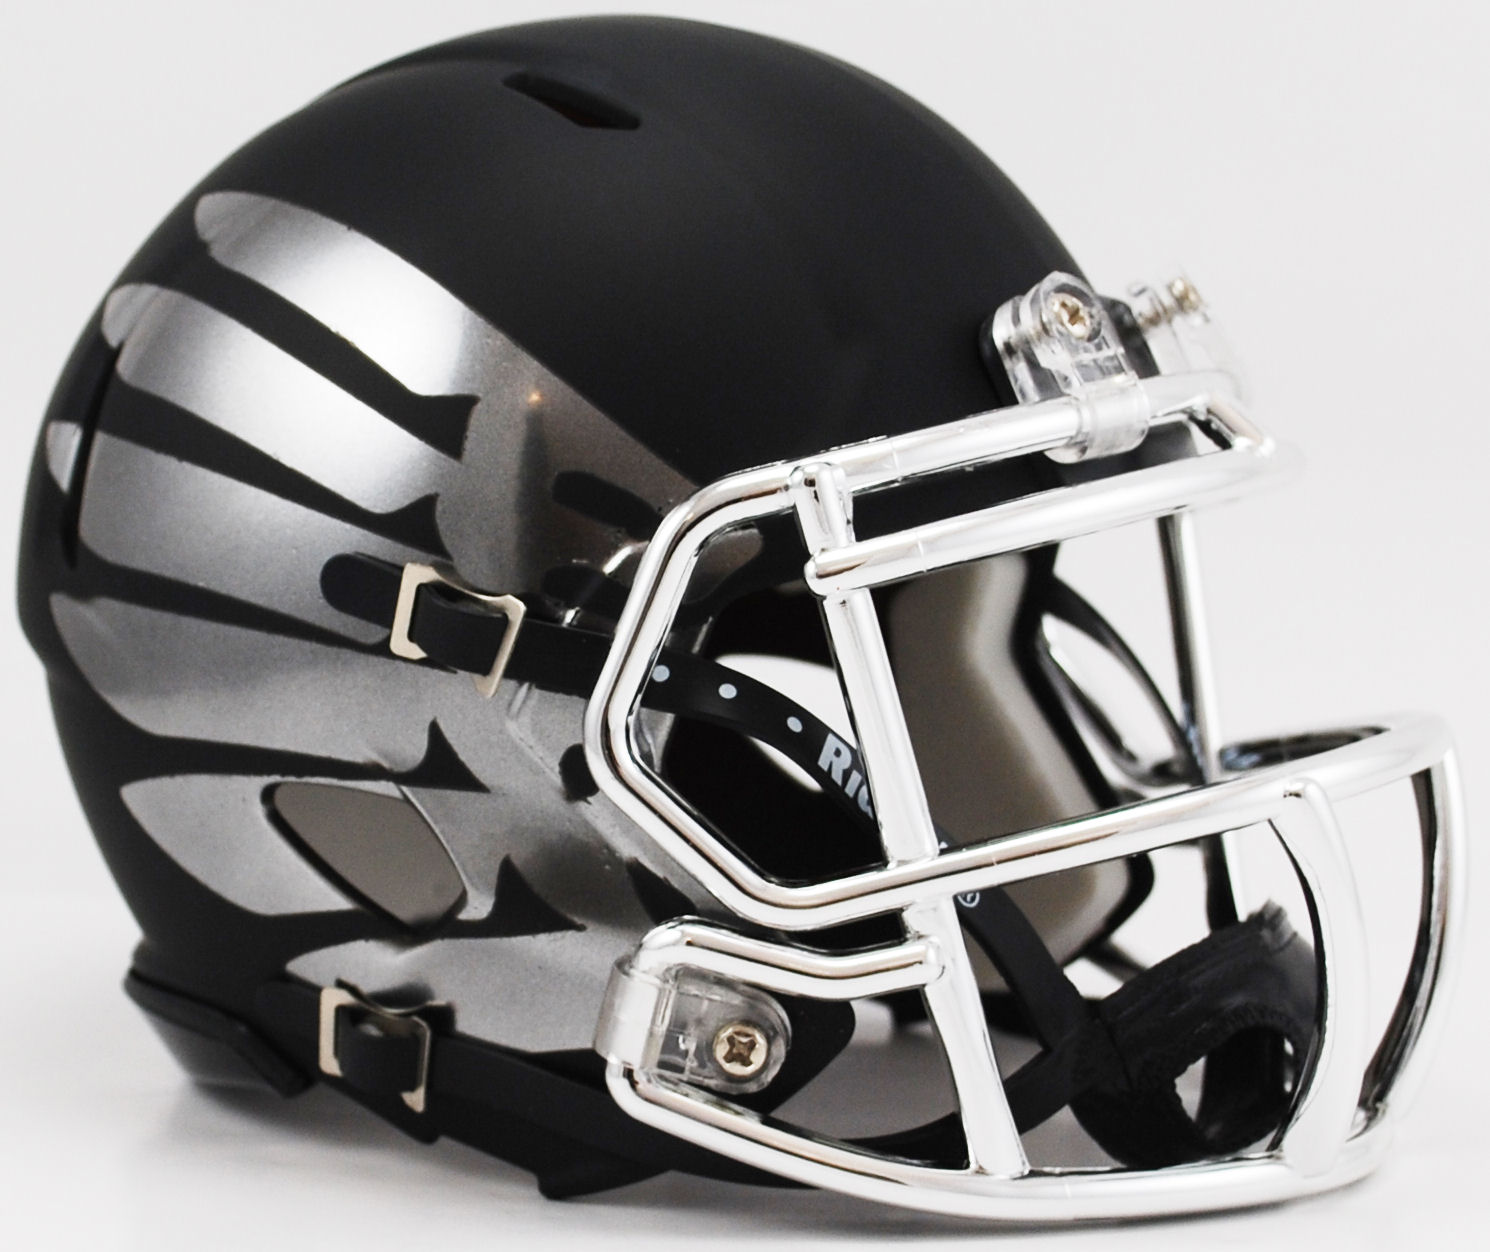 Oregon Ducks Liquidmetal Mini Football Helmet Titanium Black Eclipse Hydroskin Mini Football Helmet Football Helmets Oregon Ducks